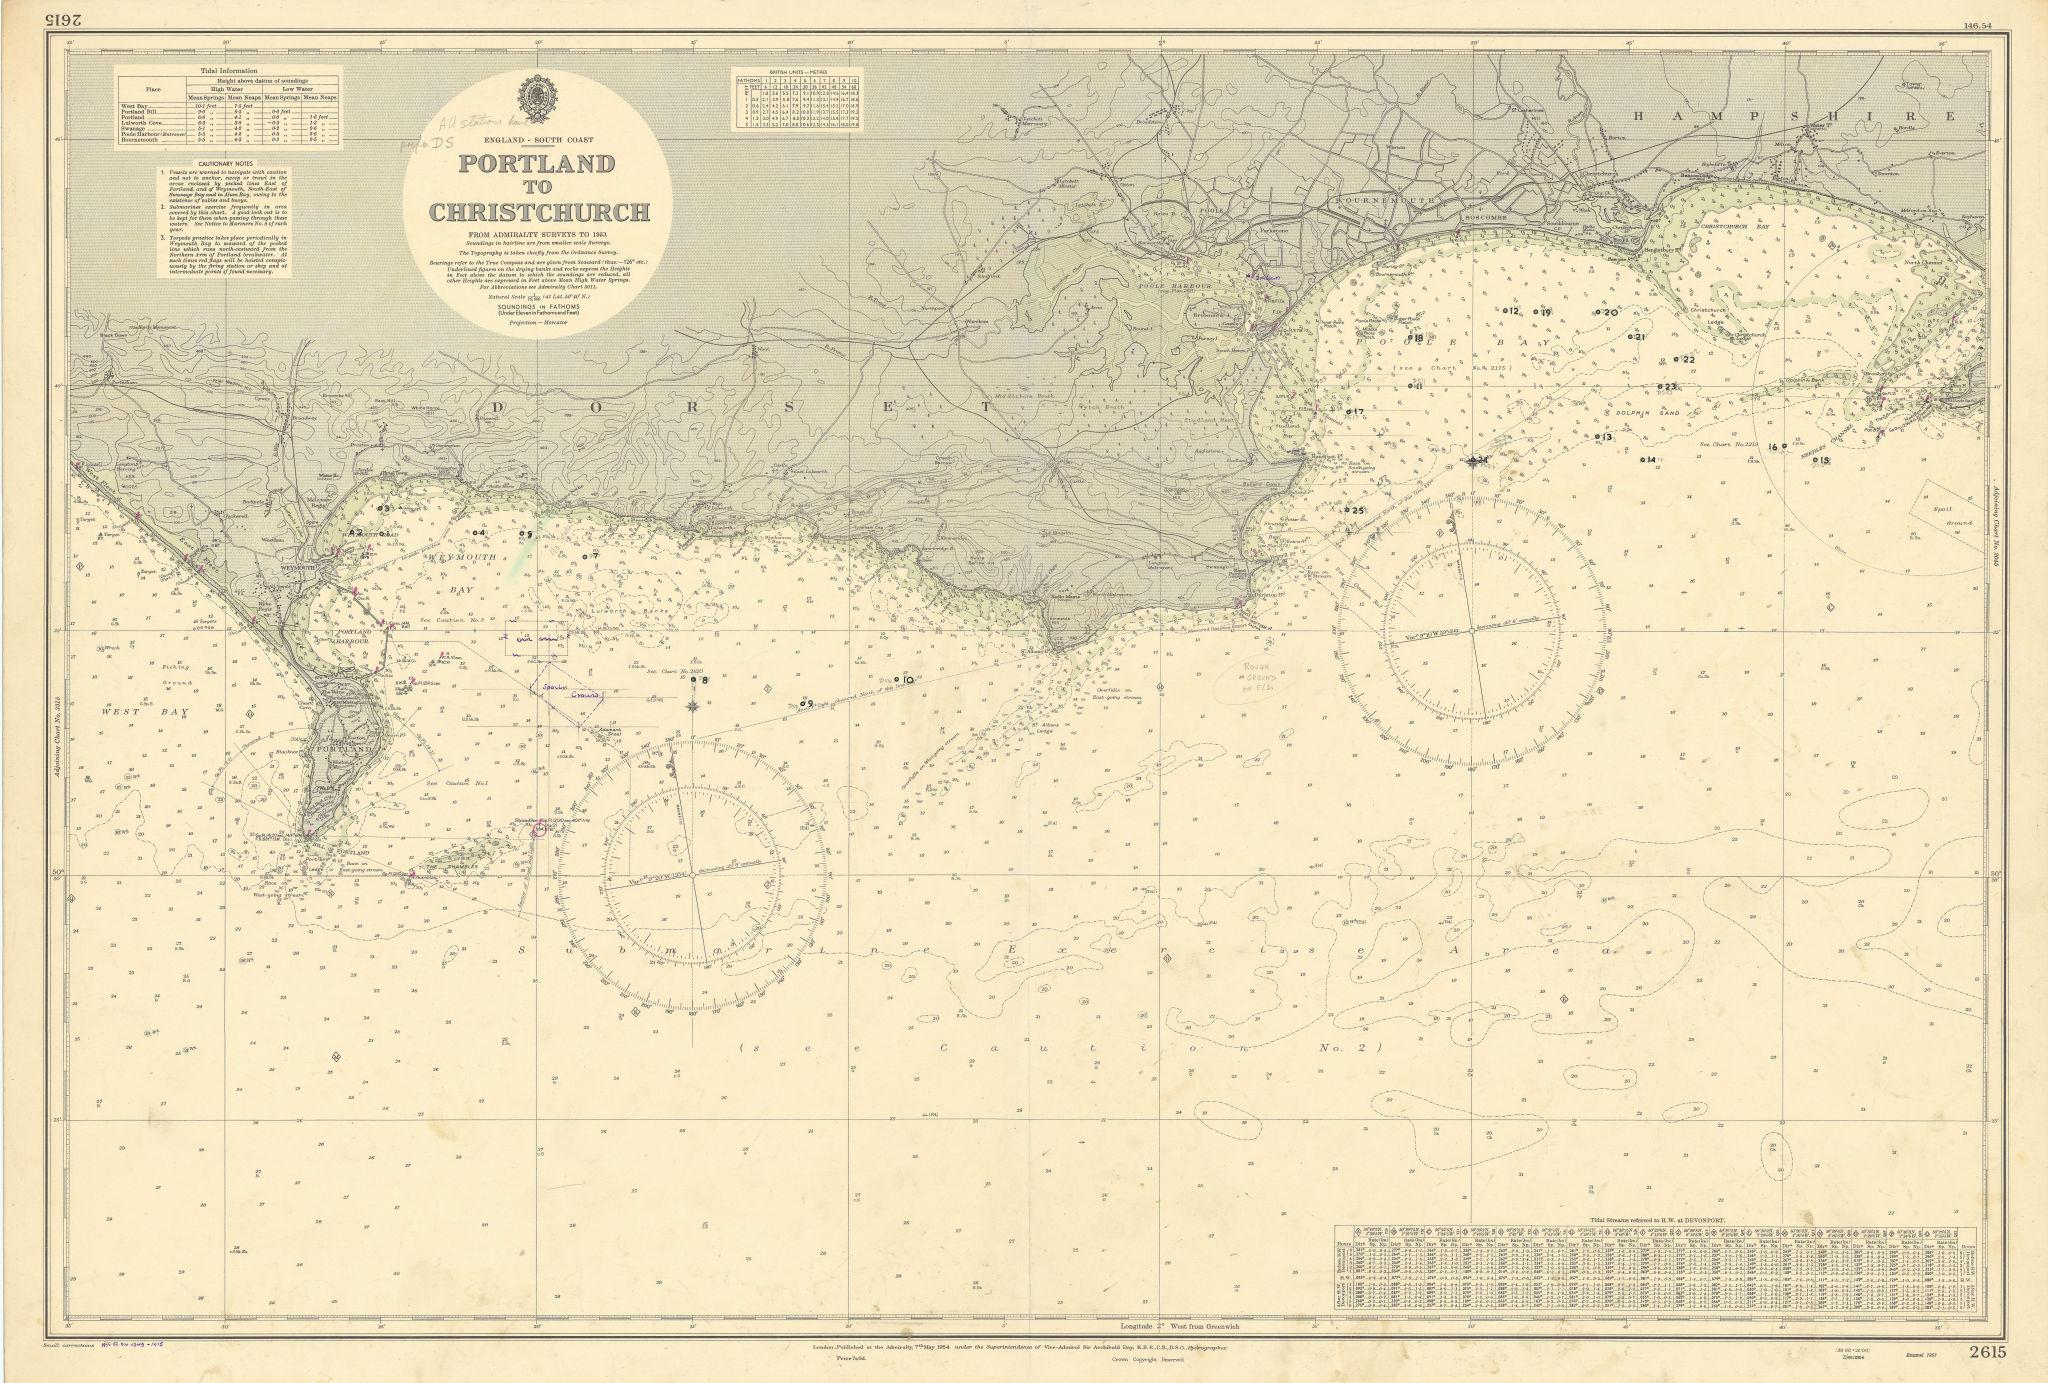 Dorset Hampshire coast Portland-Christchurch ADMIRALTY sea chart 1954 (1955) map